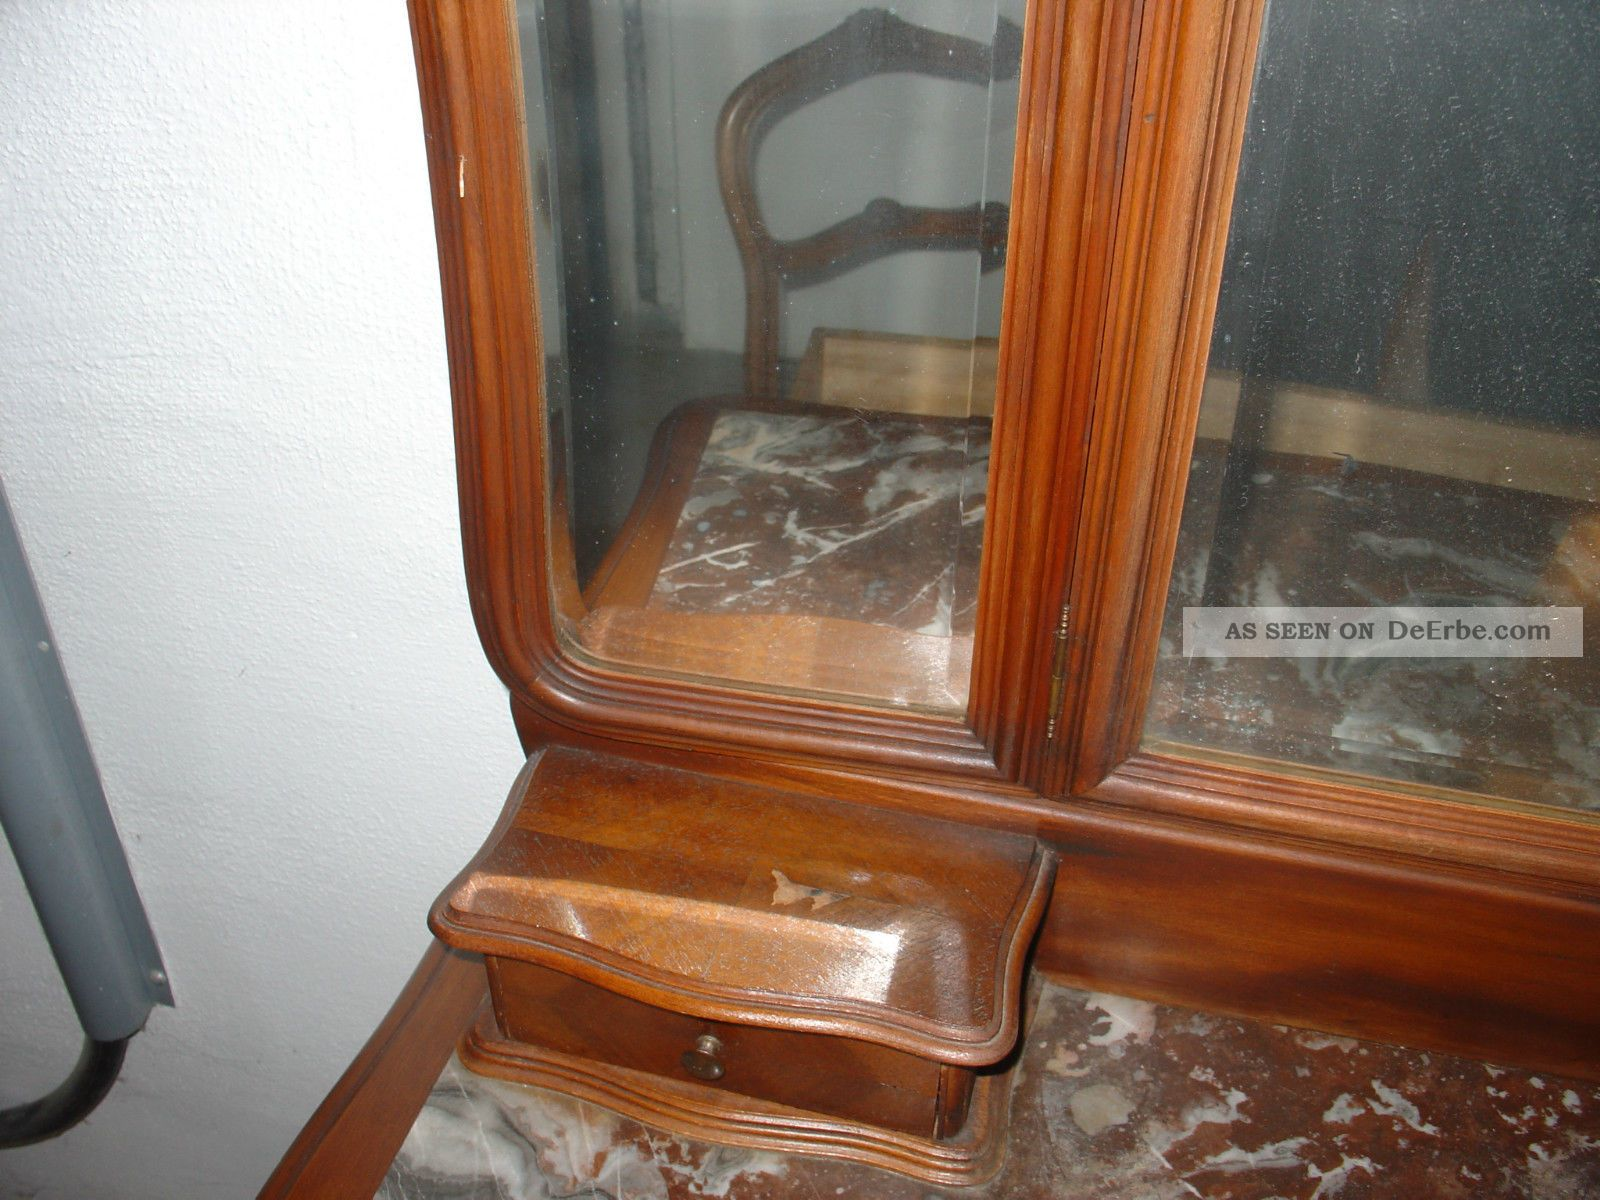 antike frisierkommode spiegelkommode wiener barockstil schlafzimmer stuttgart. Black Bedroom Furniture Sets. Home Design Ideas